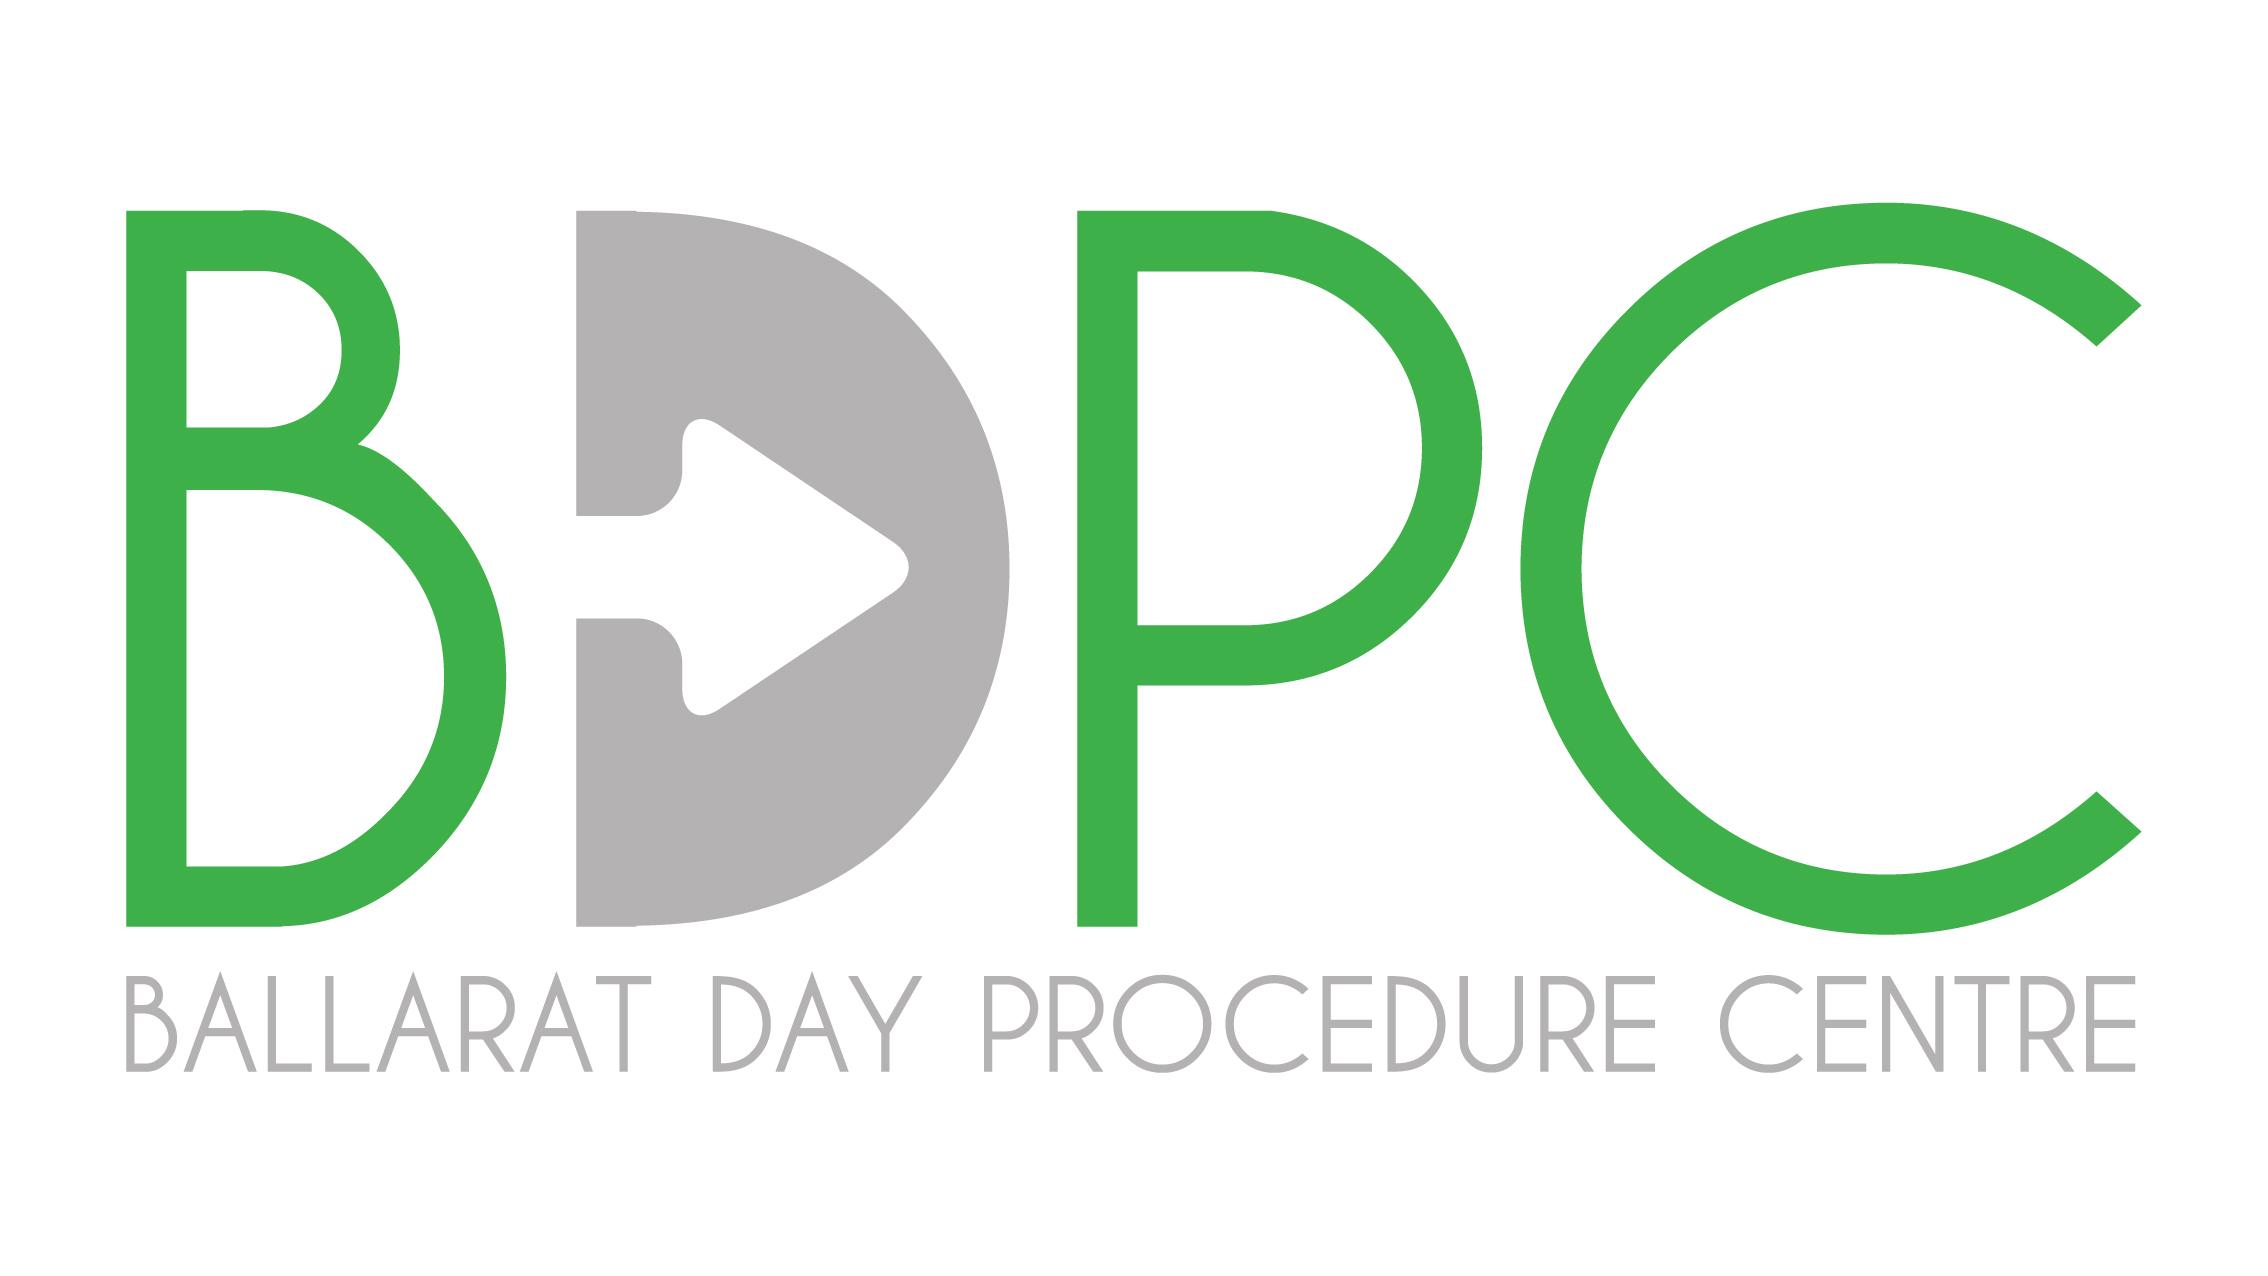 Ballarat Day Procedure Centre image